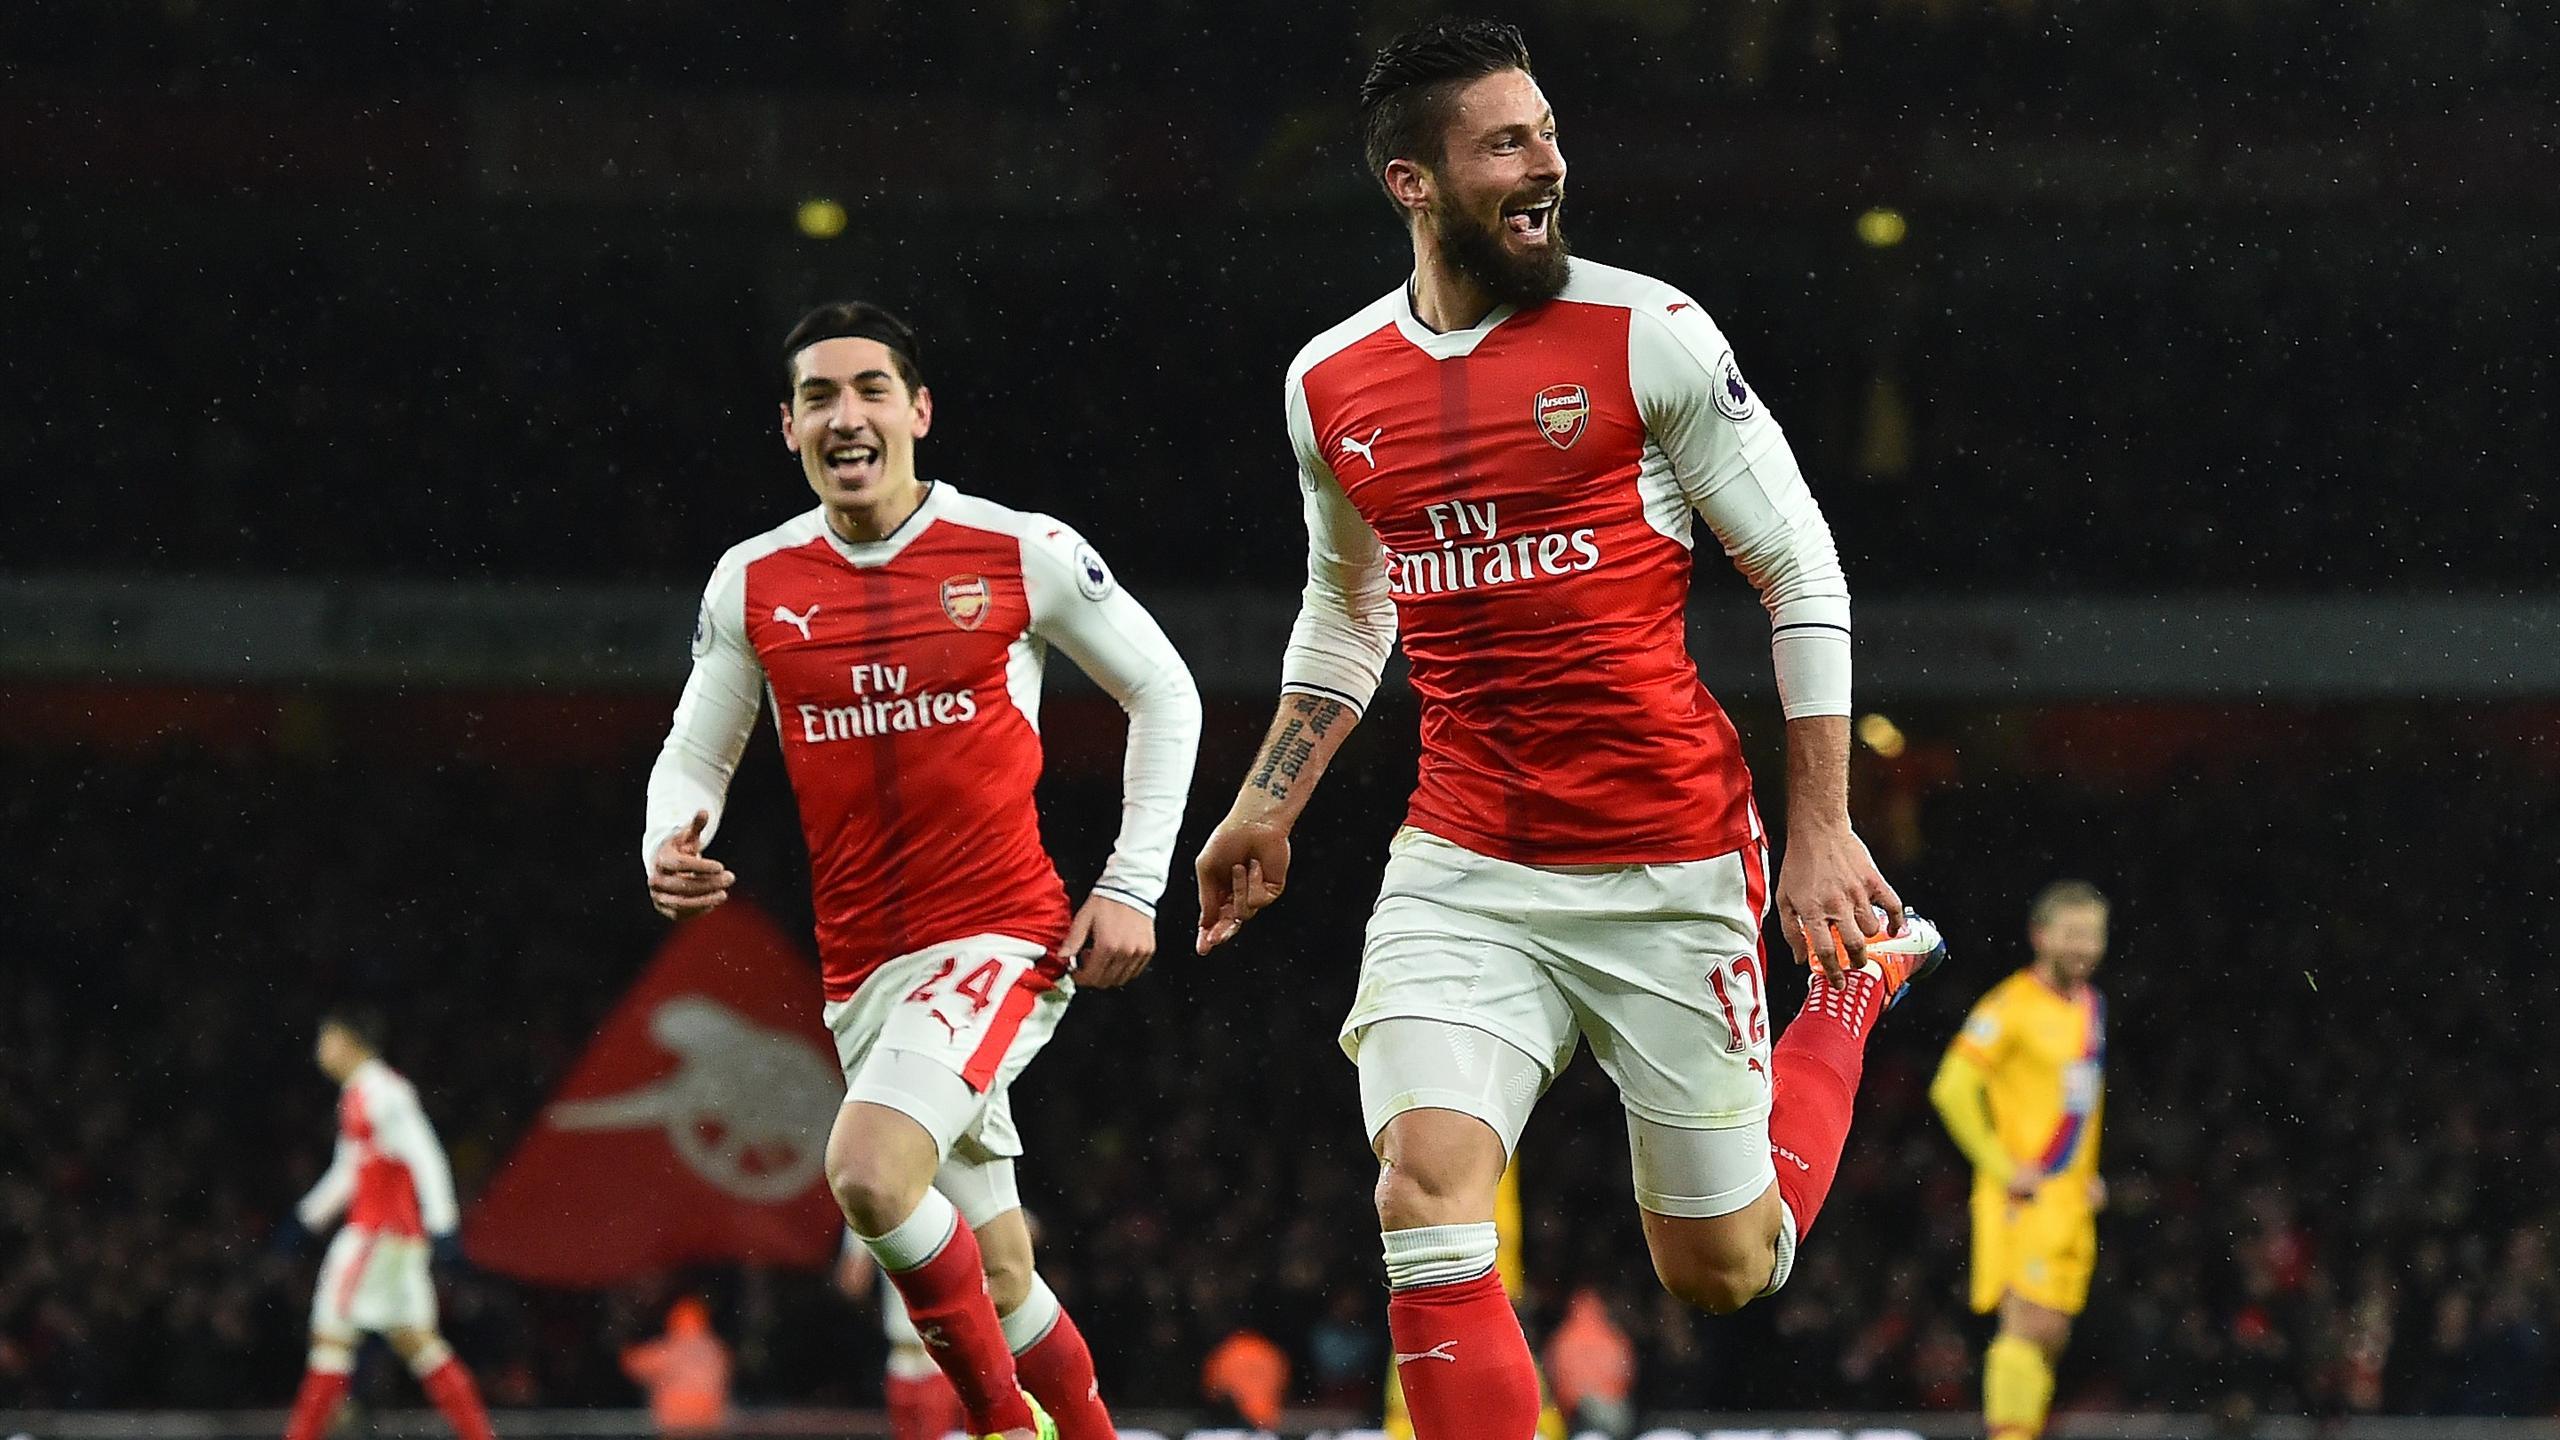 Arsenal's French striker Olivier Giroud celebrates scoring his team's first goal